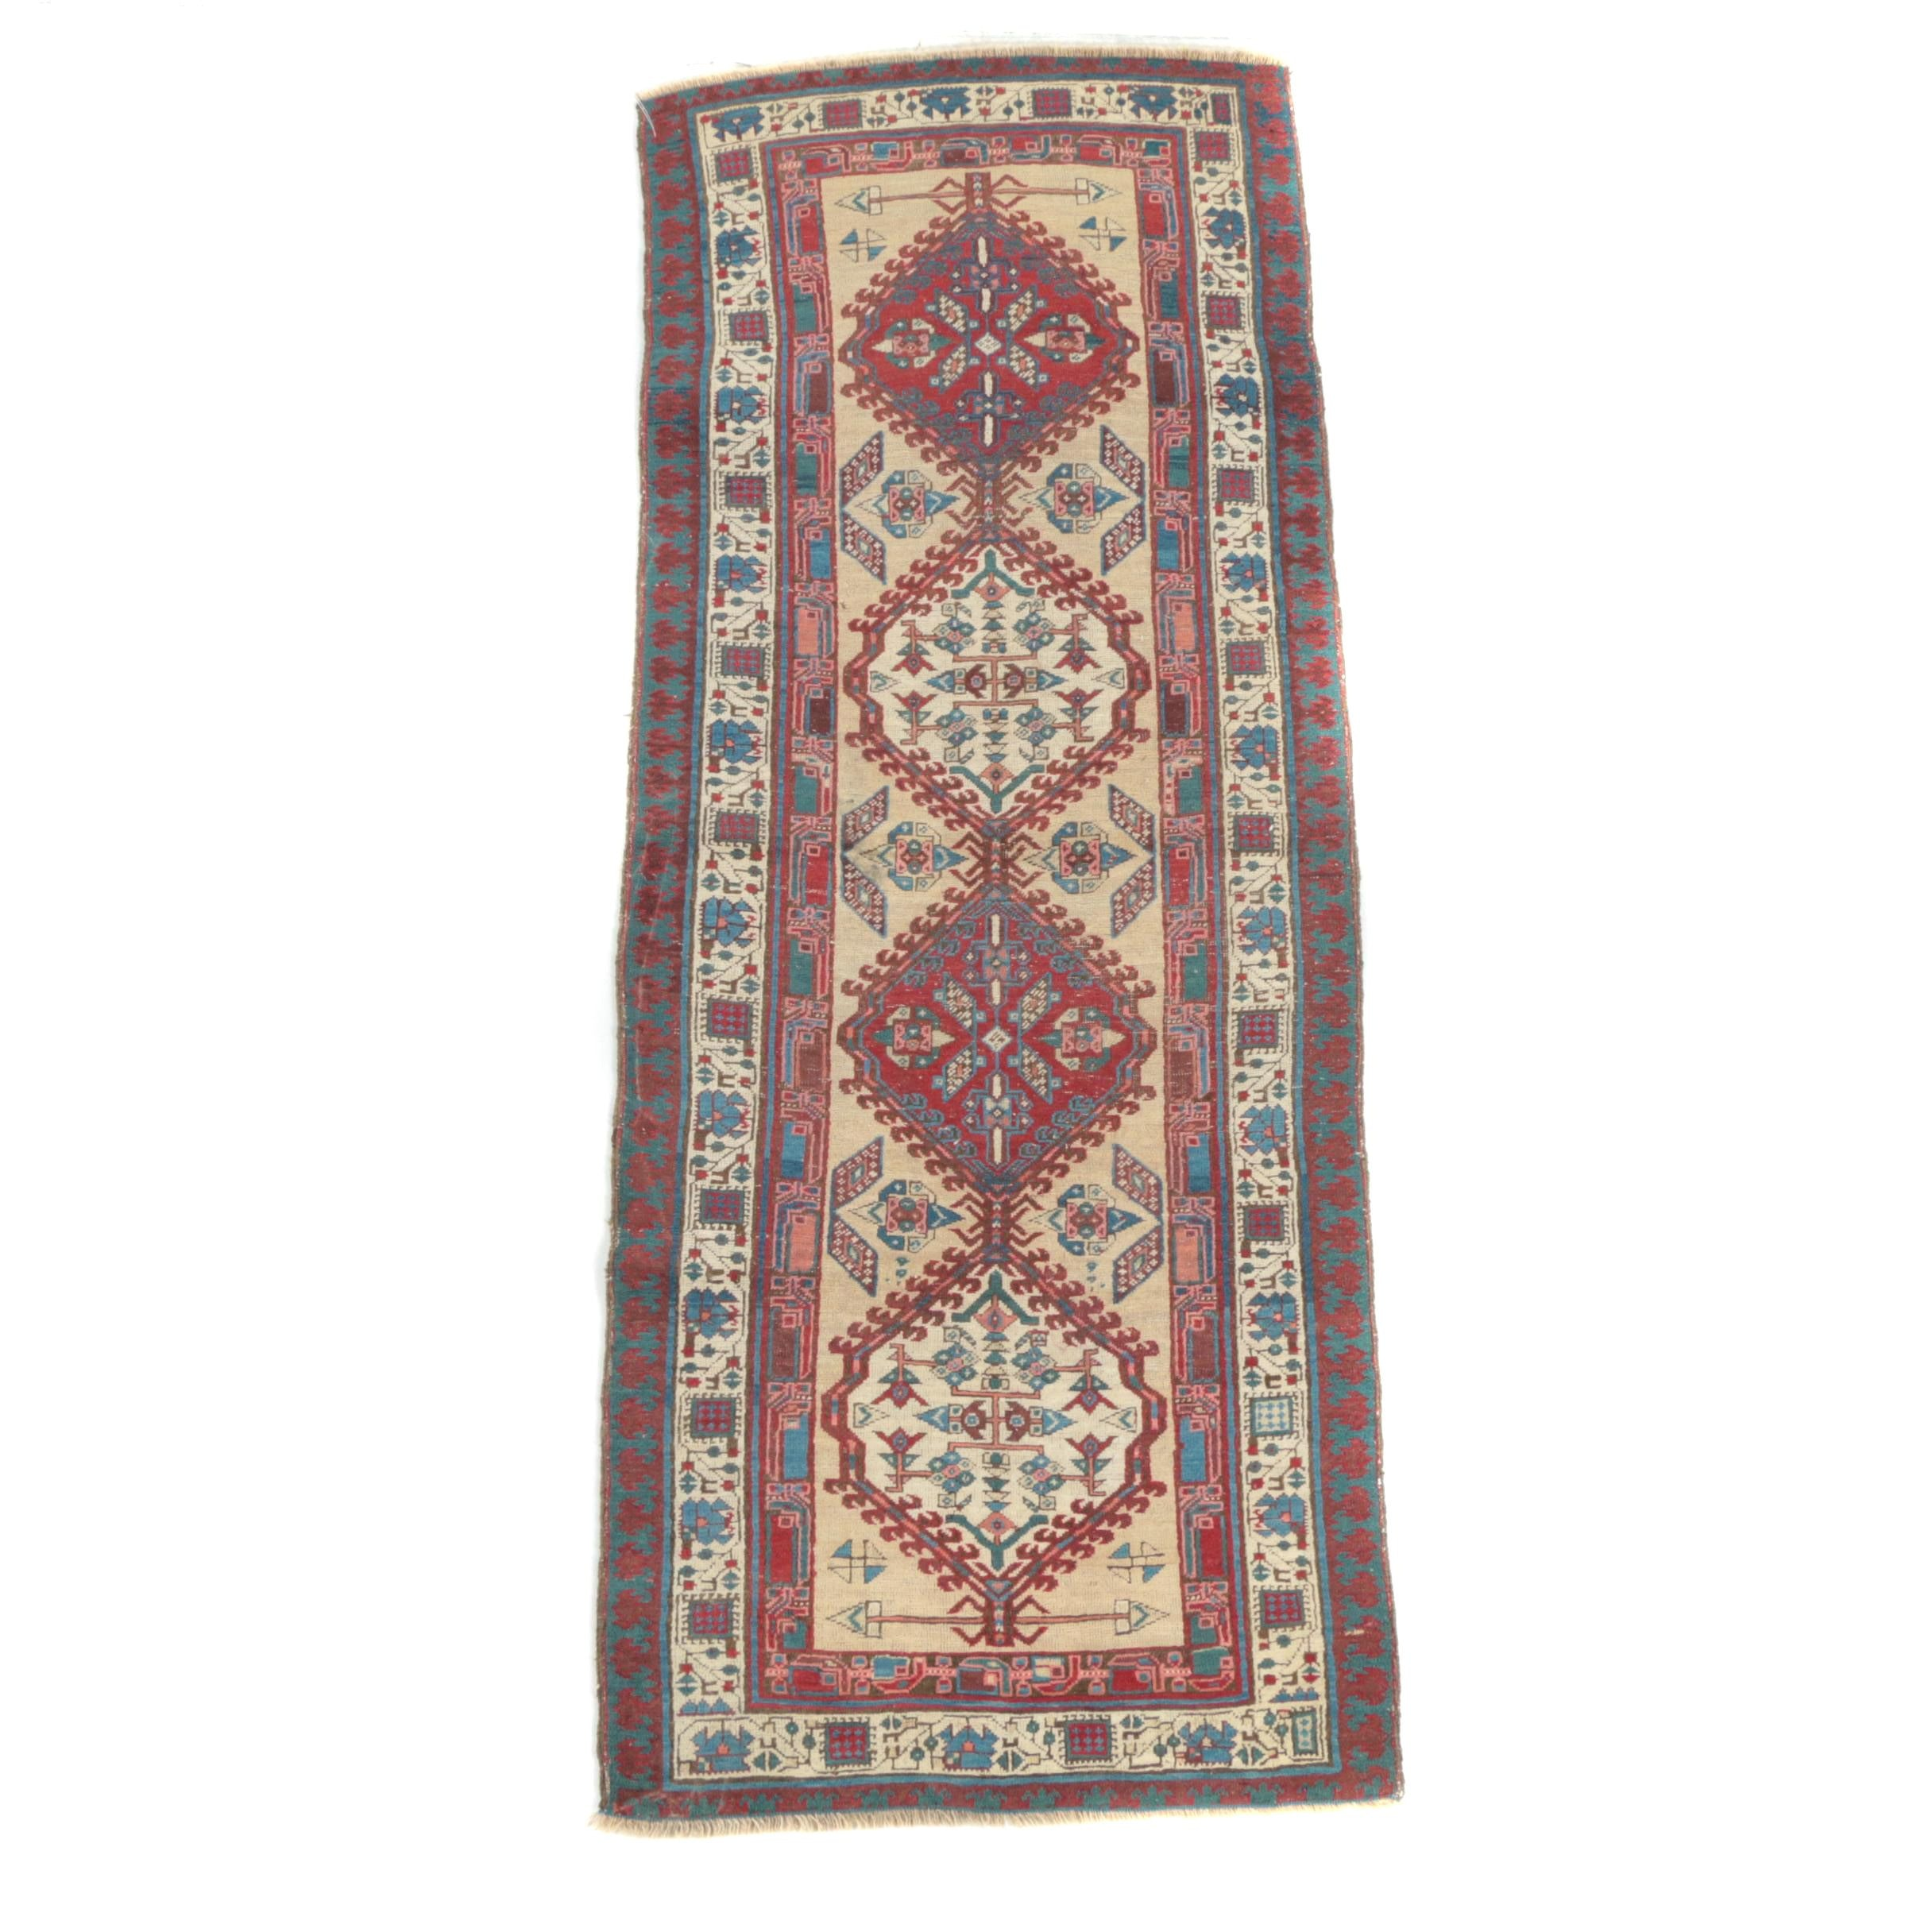 Hand-Knotted Caucasian Kazak Wool Carpet Runner